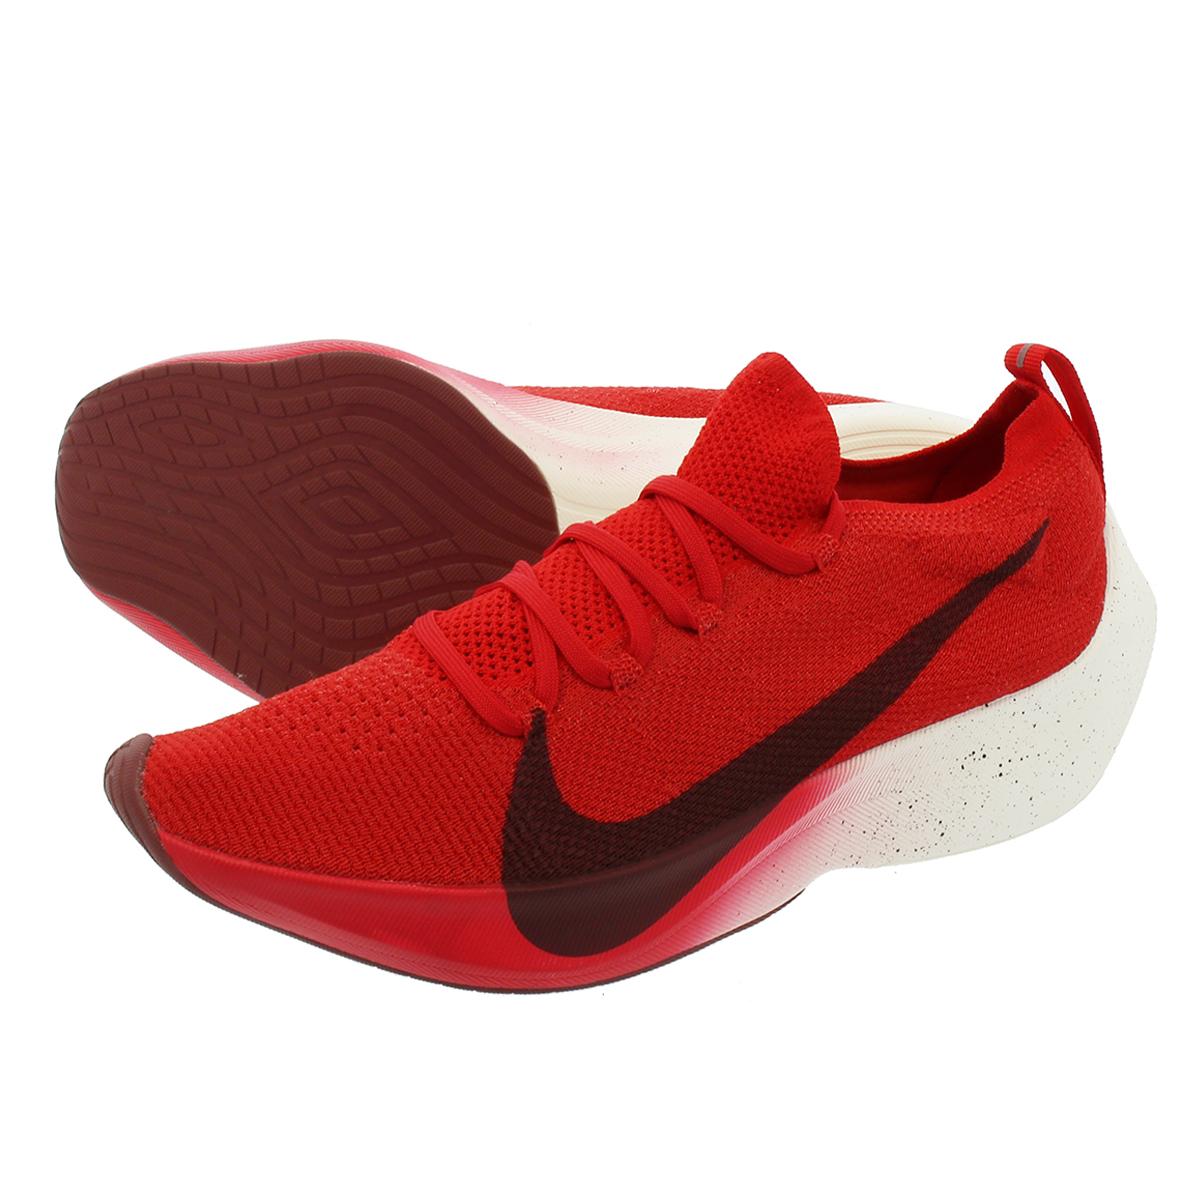 0215b5e9fb5a LOWTEX PLUS  NIKE VAPOR STREET FLYKNIT Nike vapor street fried food knit UNIVERSITY  RED DARK TEAM RED SAIL BLACK